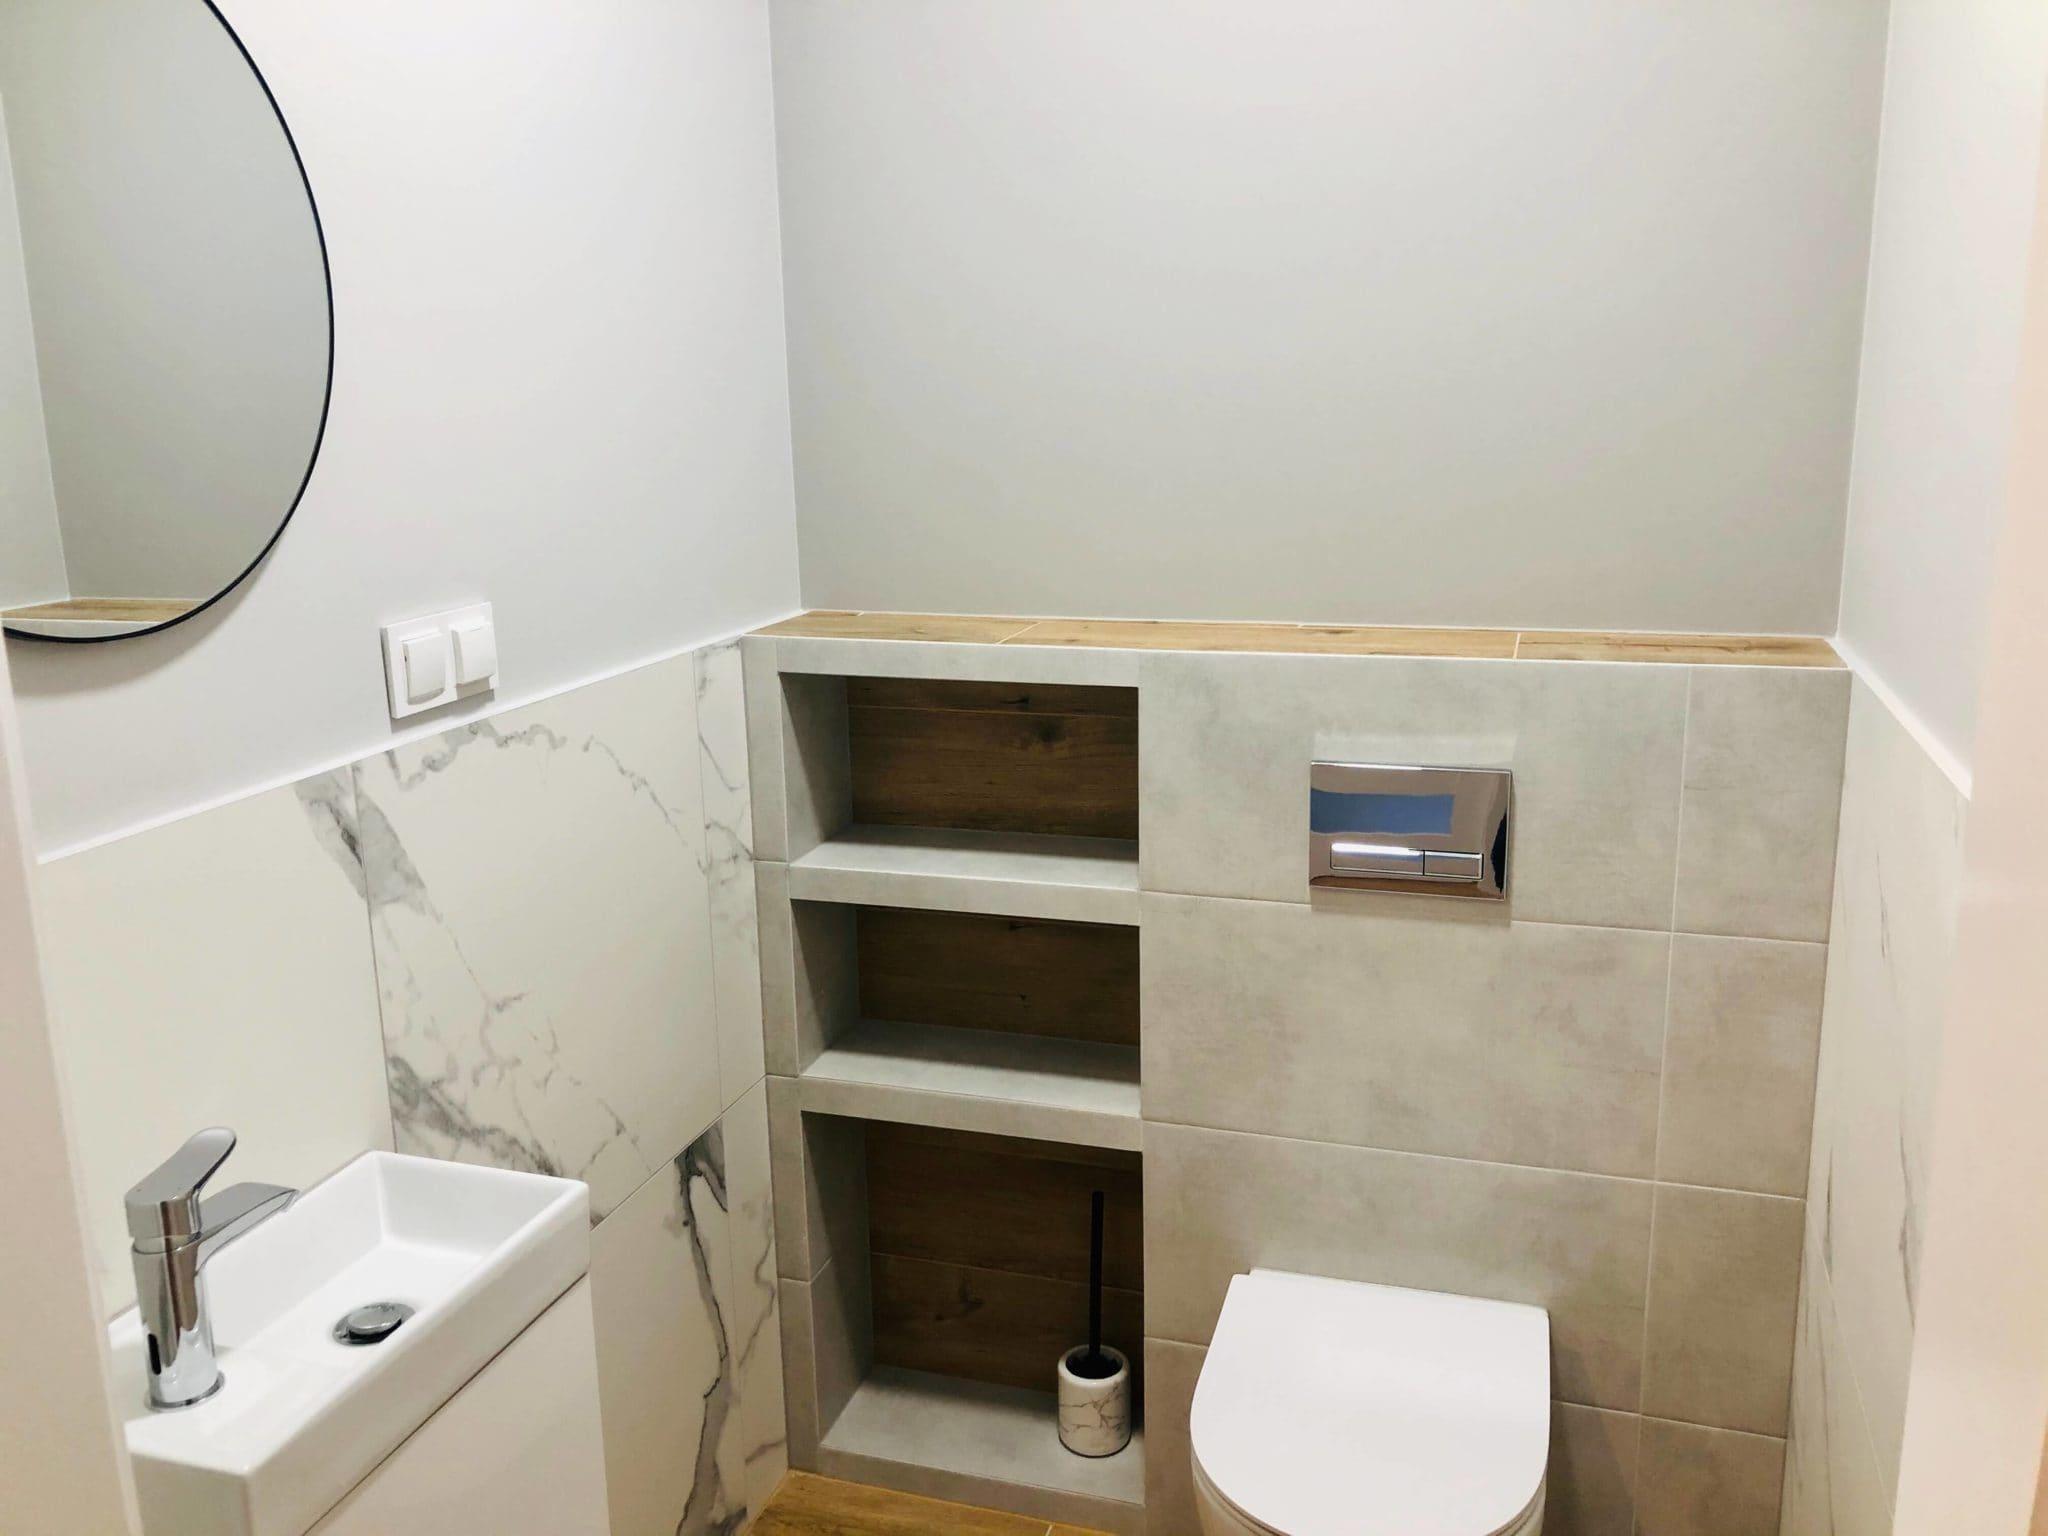 łazienka terakota